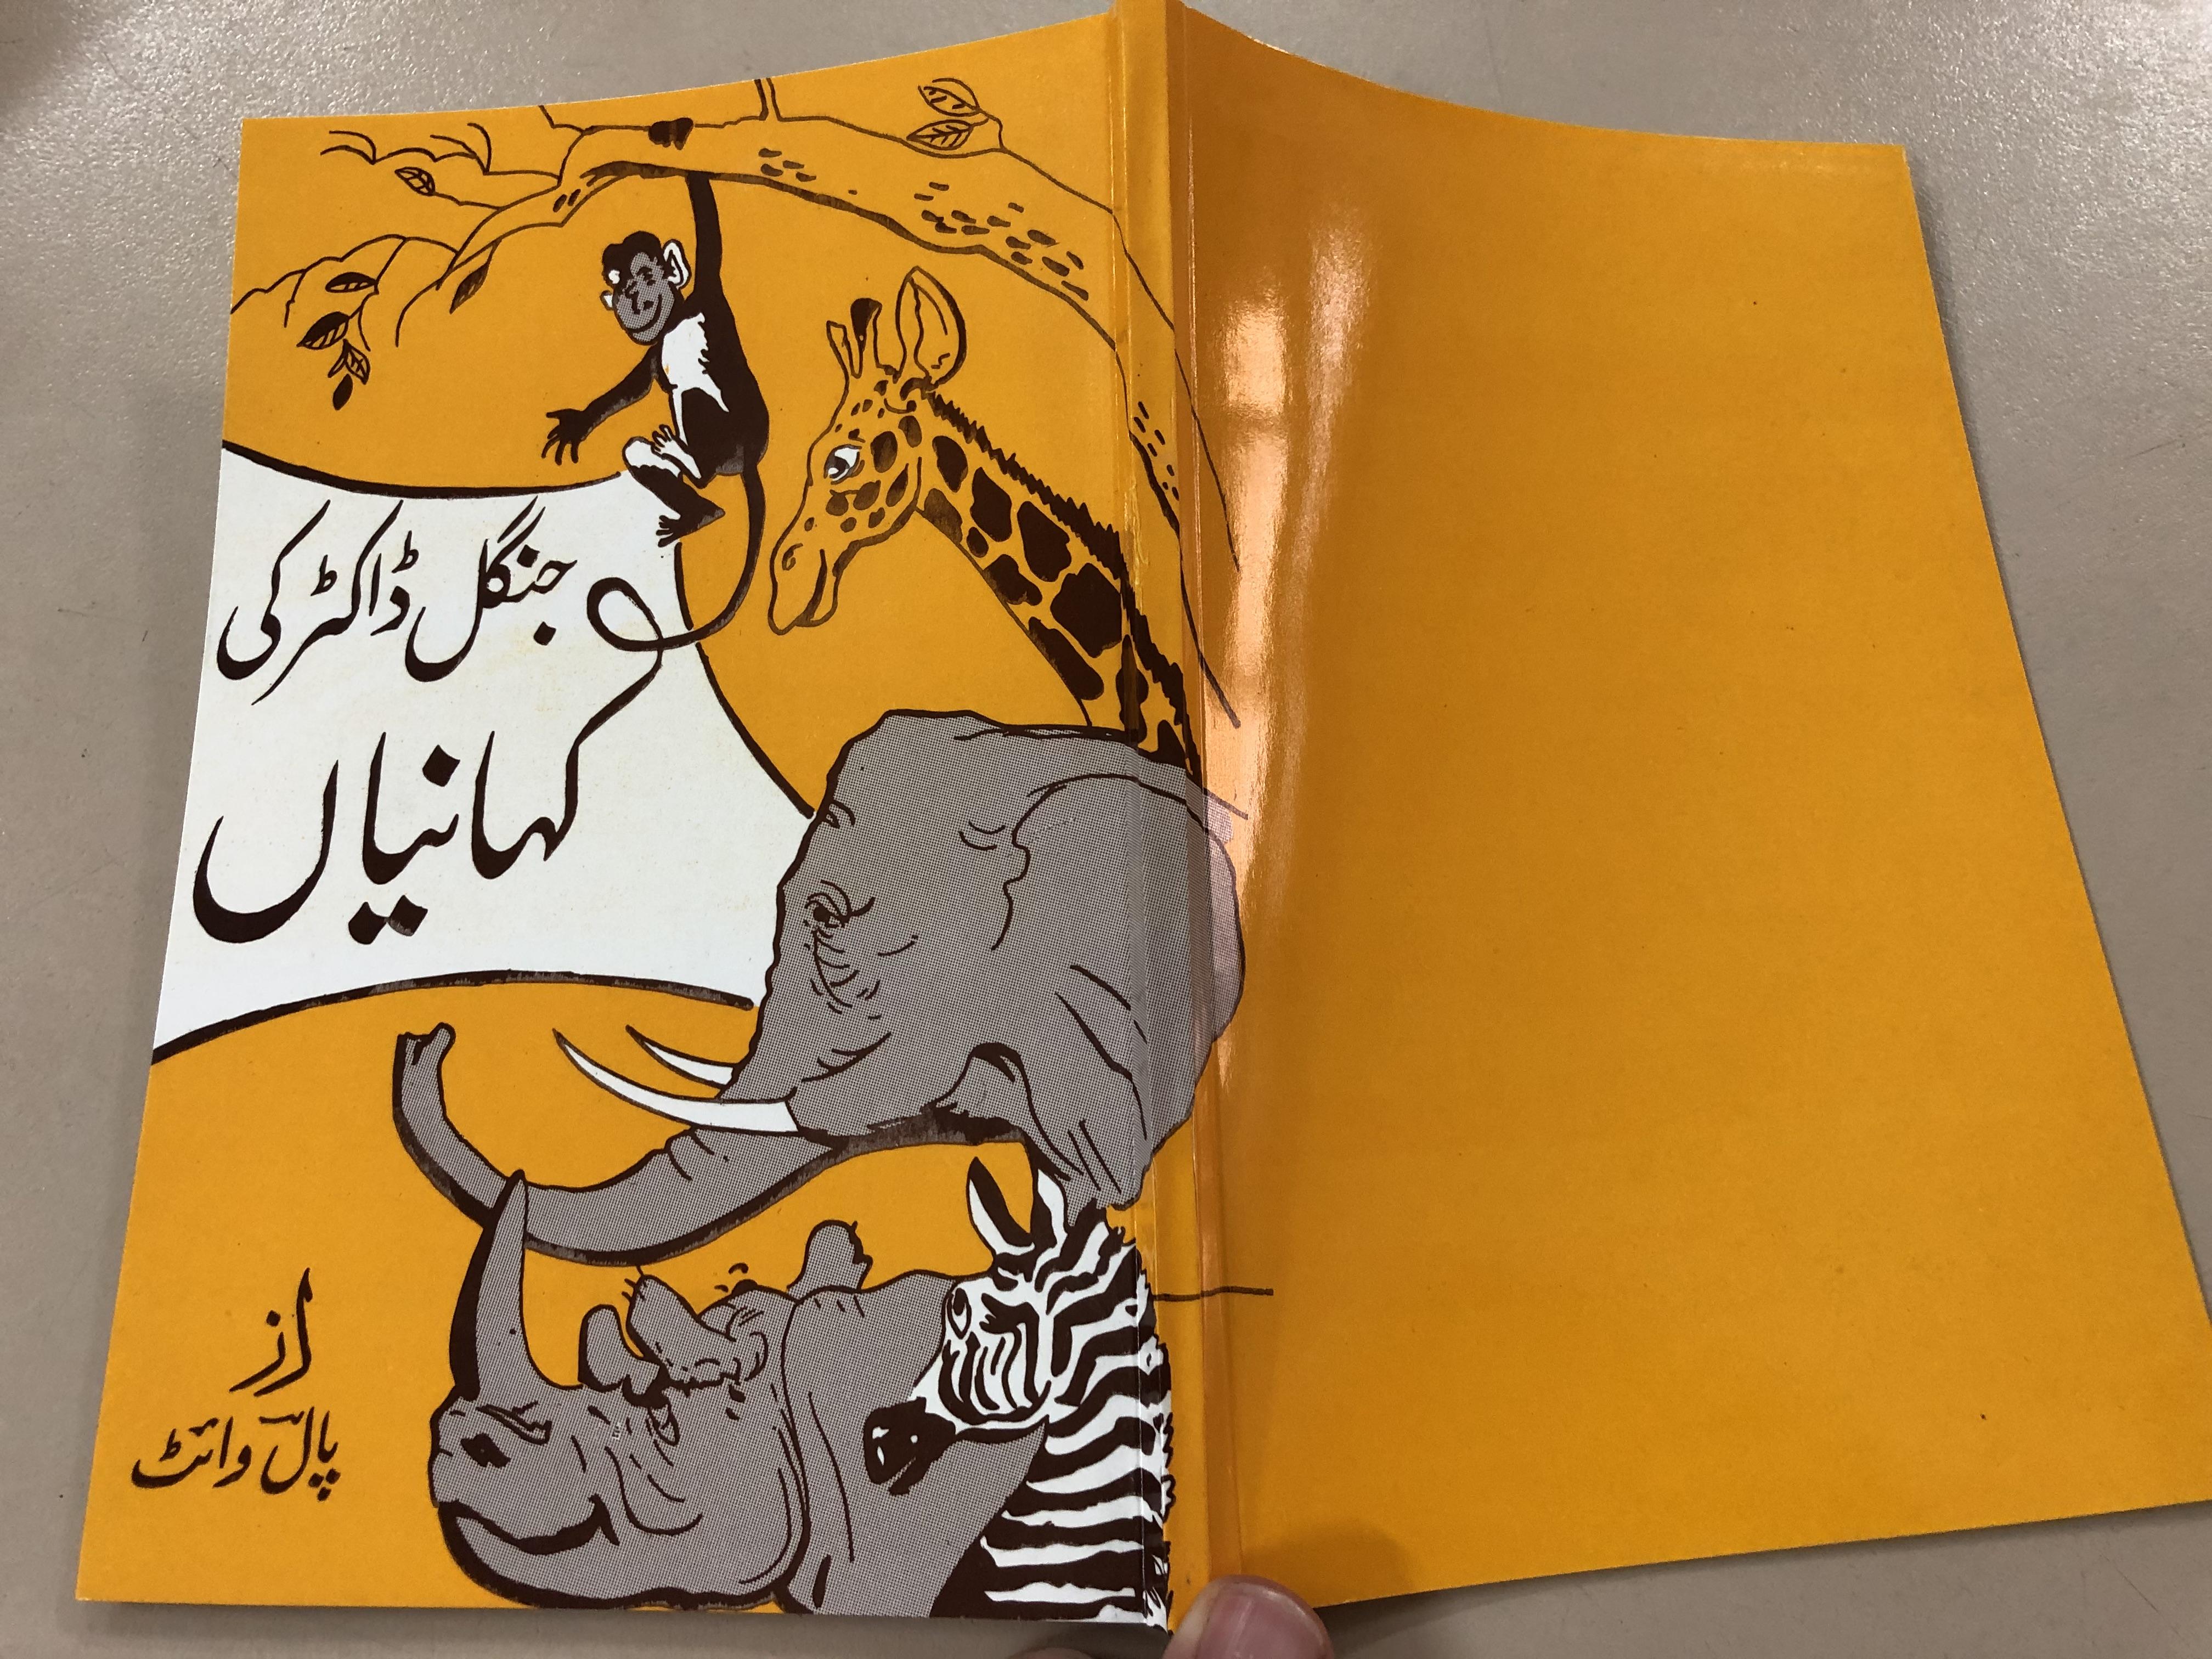 animal-stories-in-urdu-language-paperback-2018-masihi-isha-at-khana-brilliantly-written-animal-stories-with-a-forceful-spiritual-message-9-.jpg